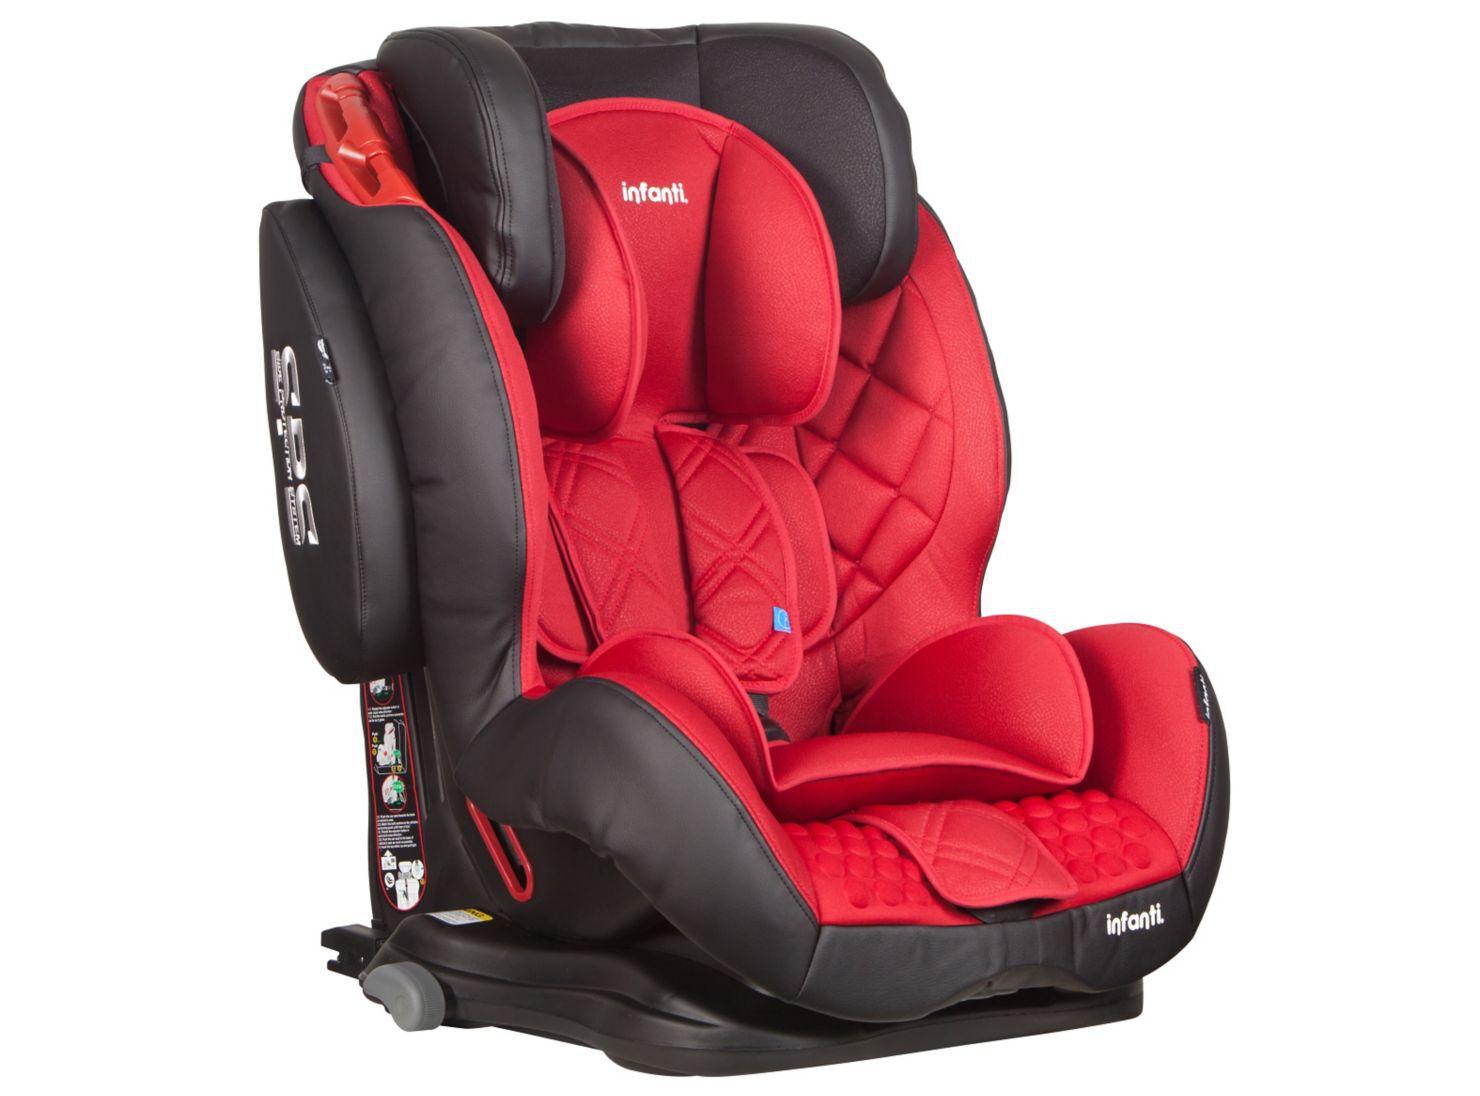 e26eac16f Infanti Butaca Elite SPS Isofix Roja/Negro en Butacas para Auto | Paris